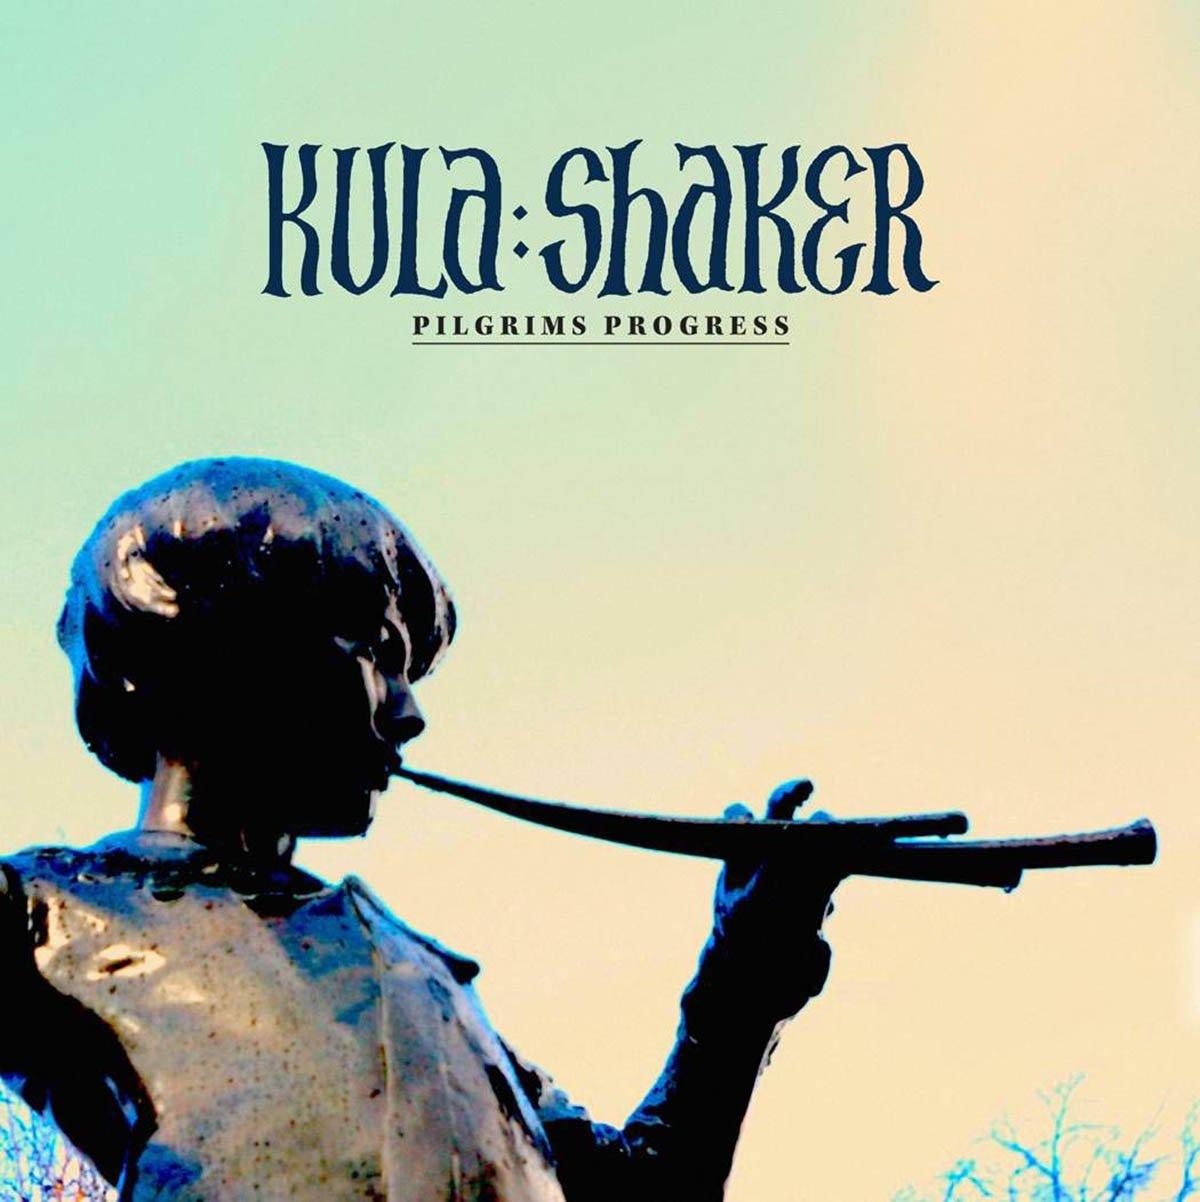 Kula Shaker, Pilgrims Progress